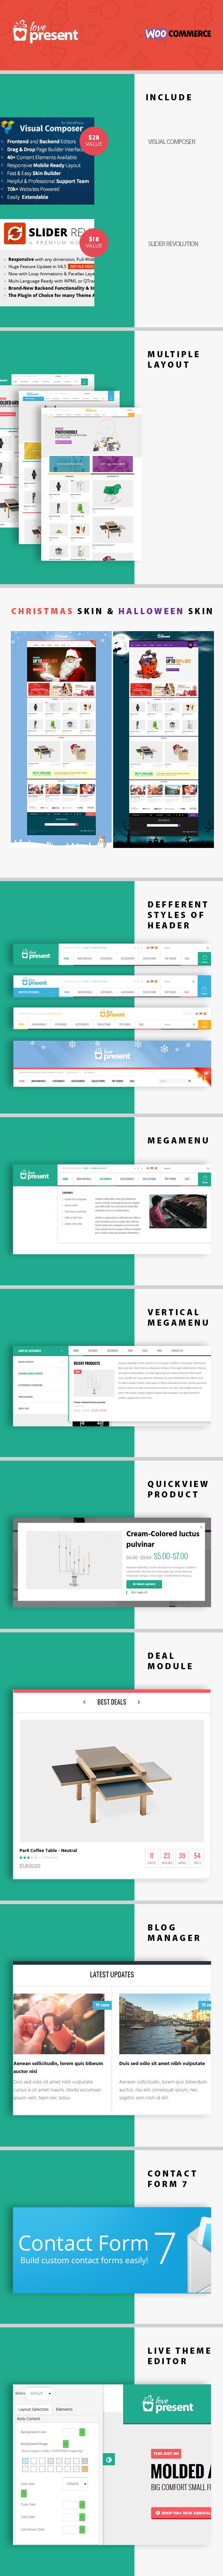 Present - Pro GiftShop WordPress Theme - 4